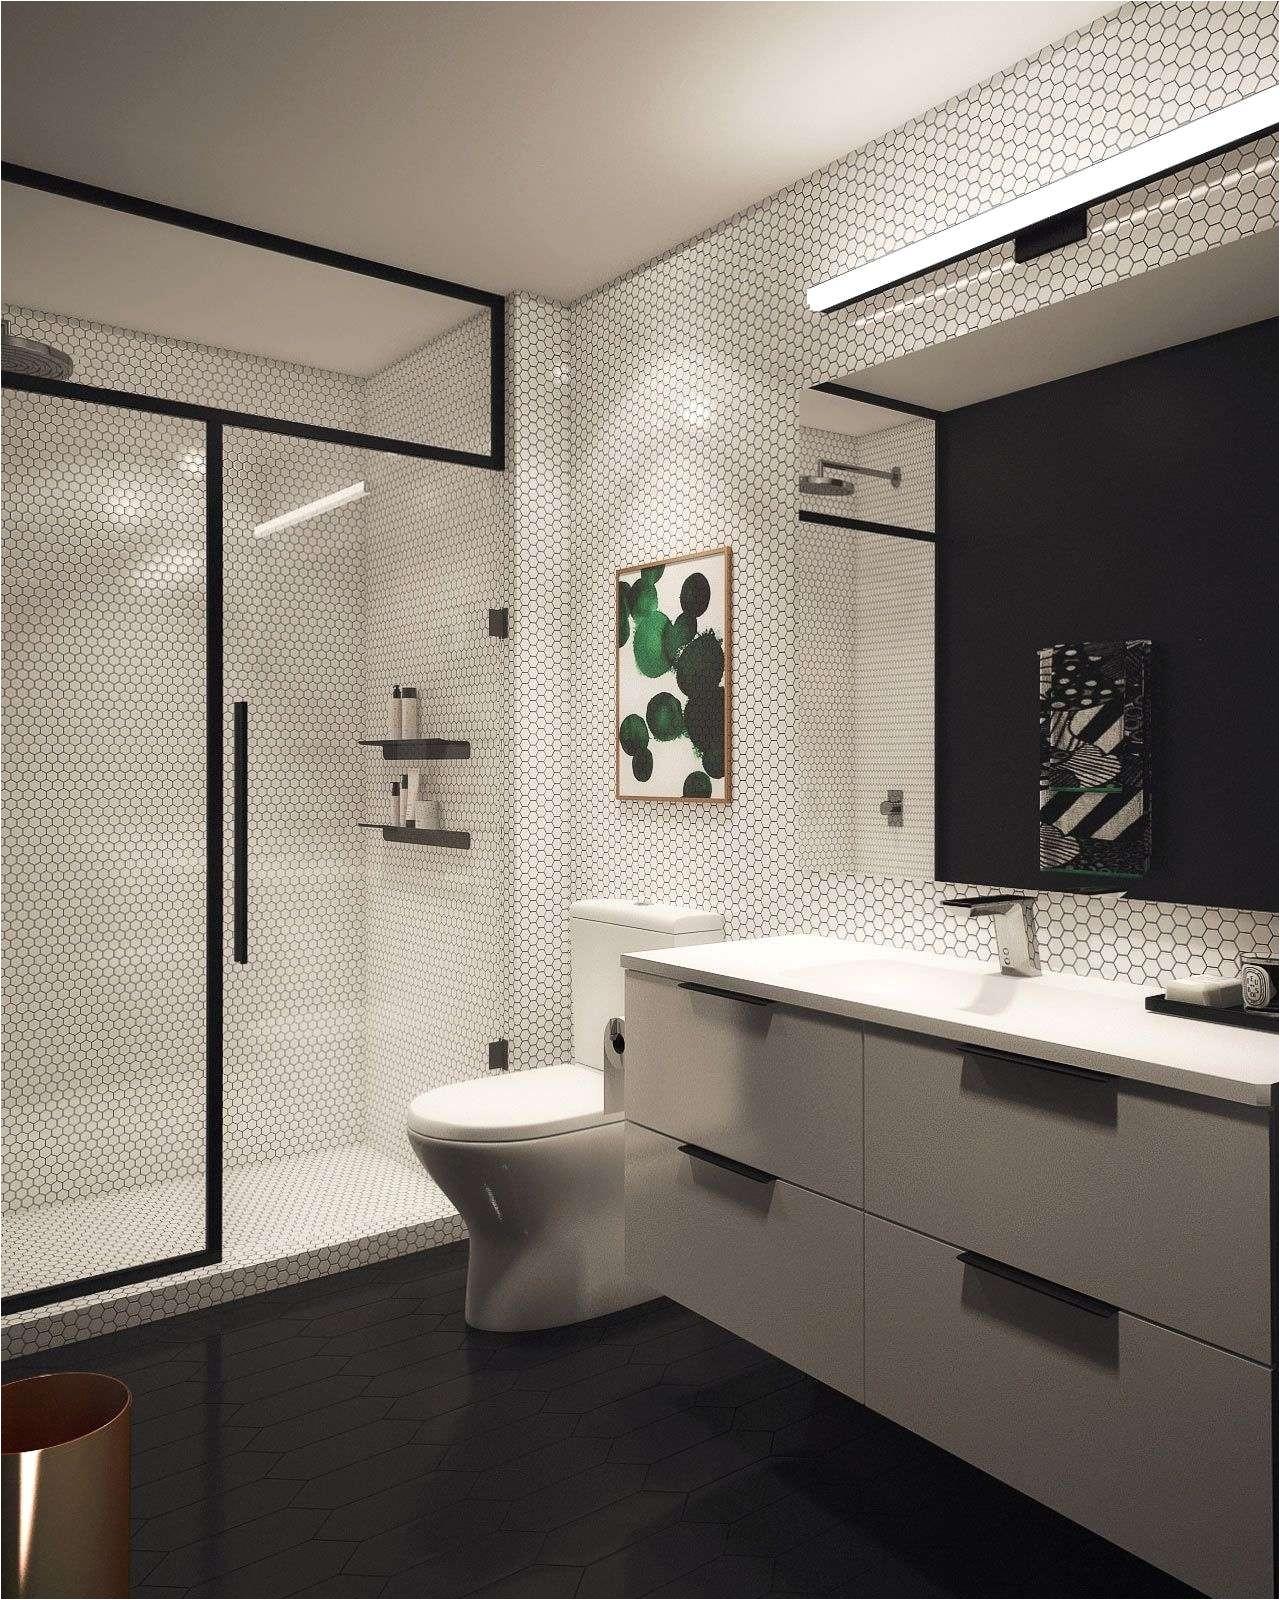 Bathroom Light Design Ideas Engaging Small Bathroom Idea or Lovely Small Bathroom Lighting Fresh